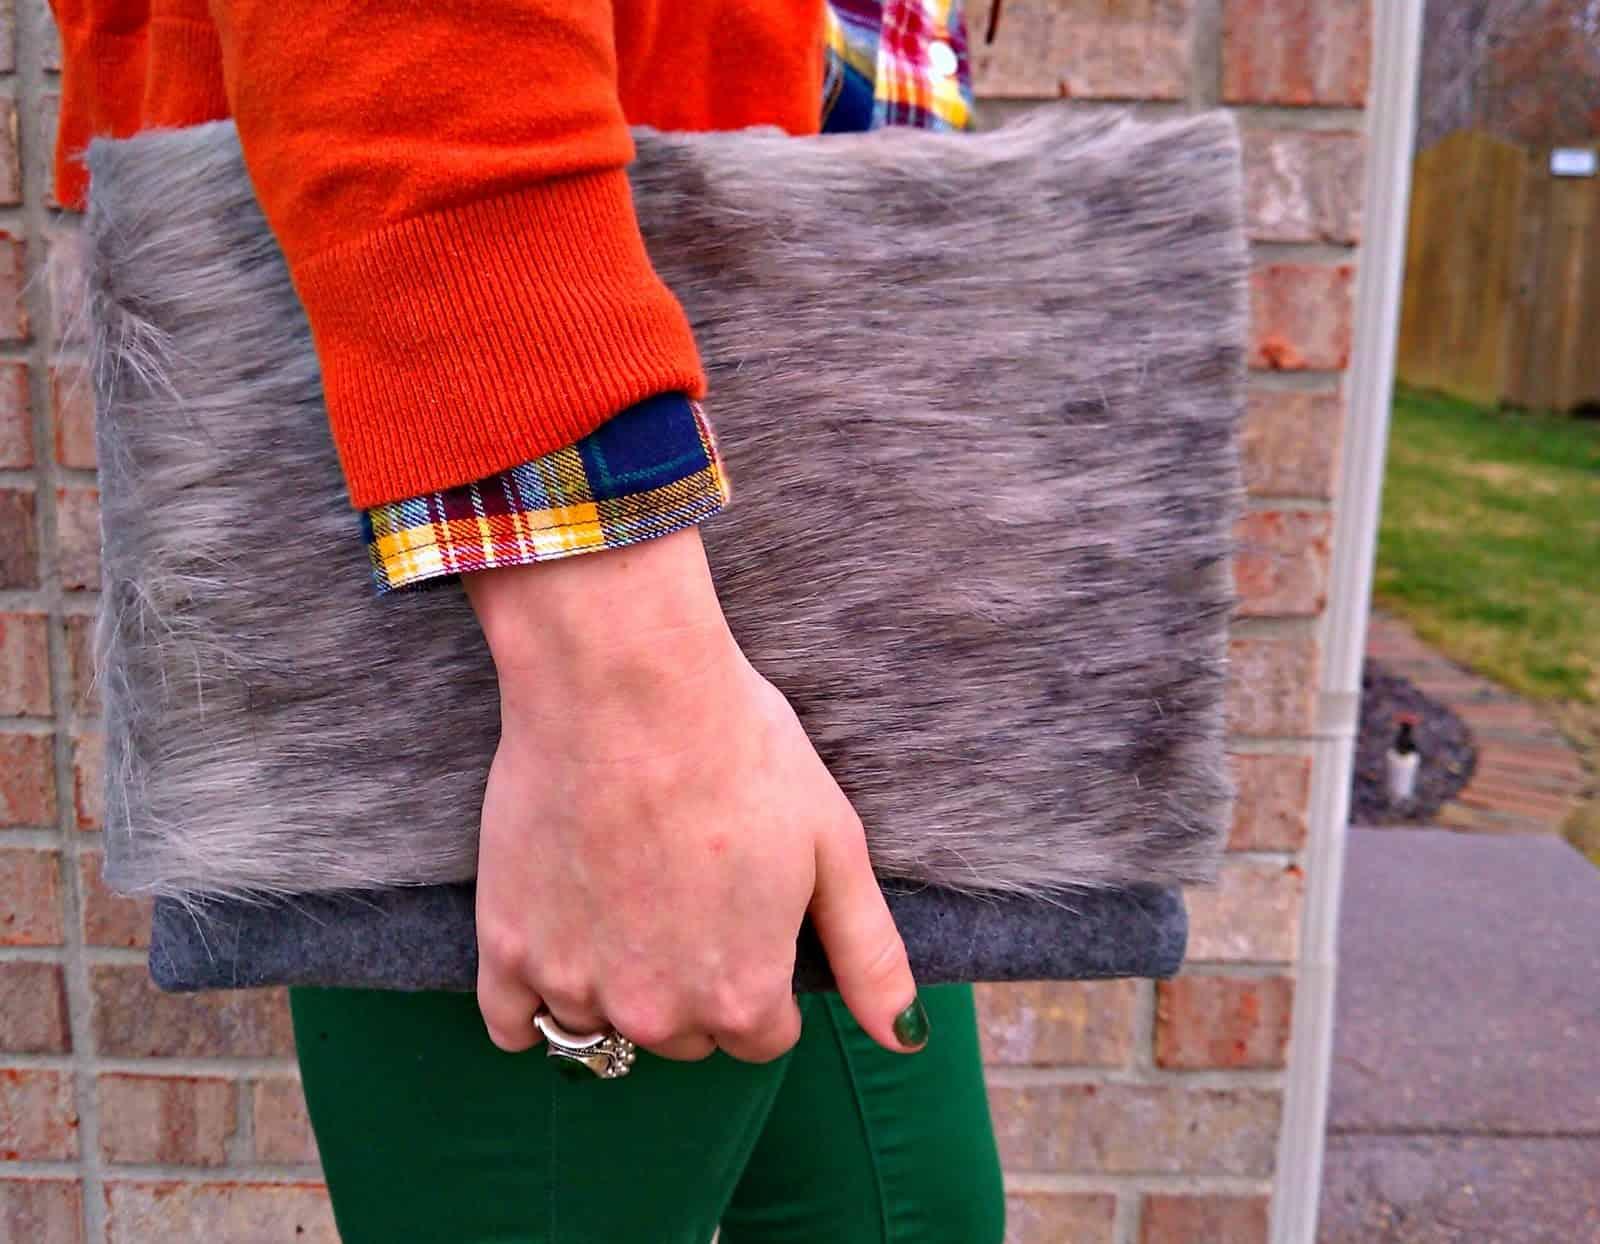 Rustic felt and faux fur clutch